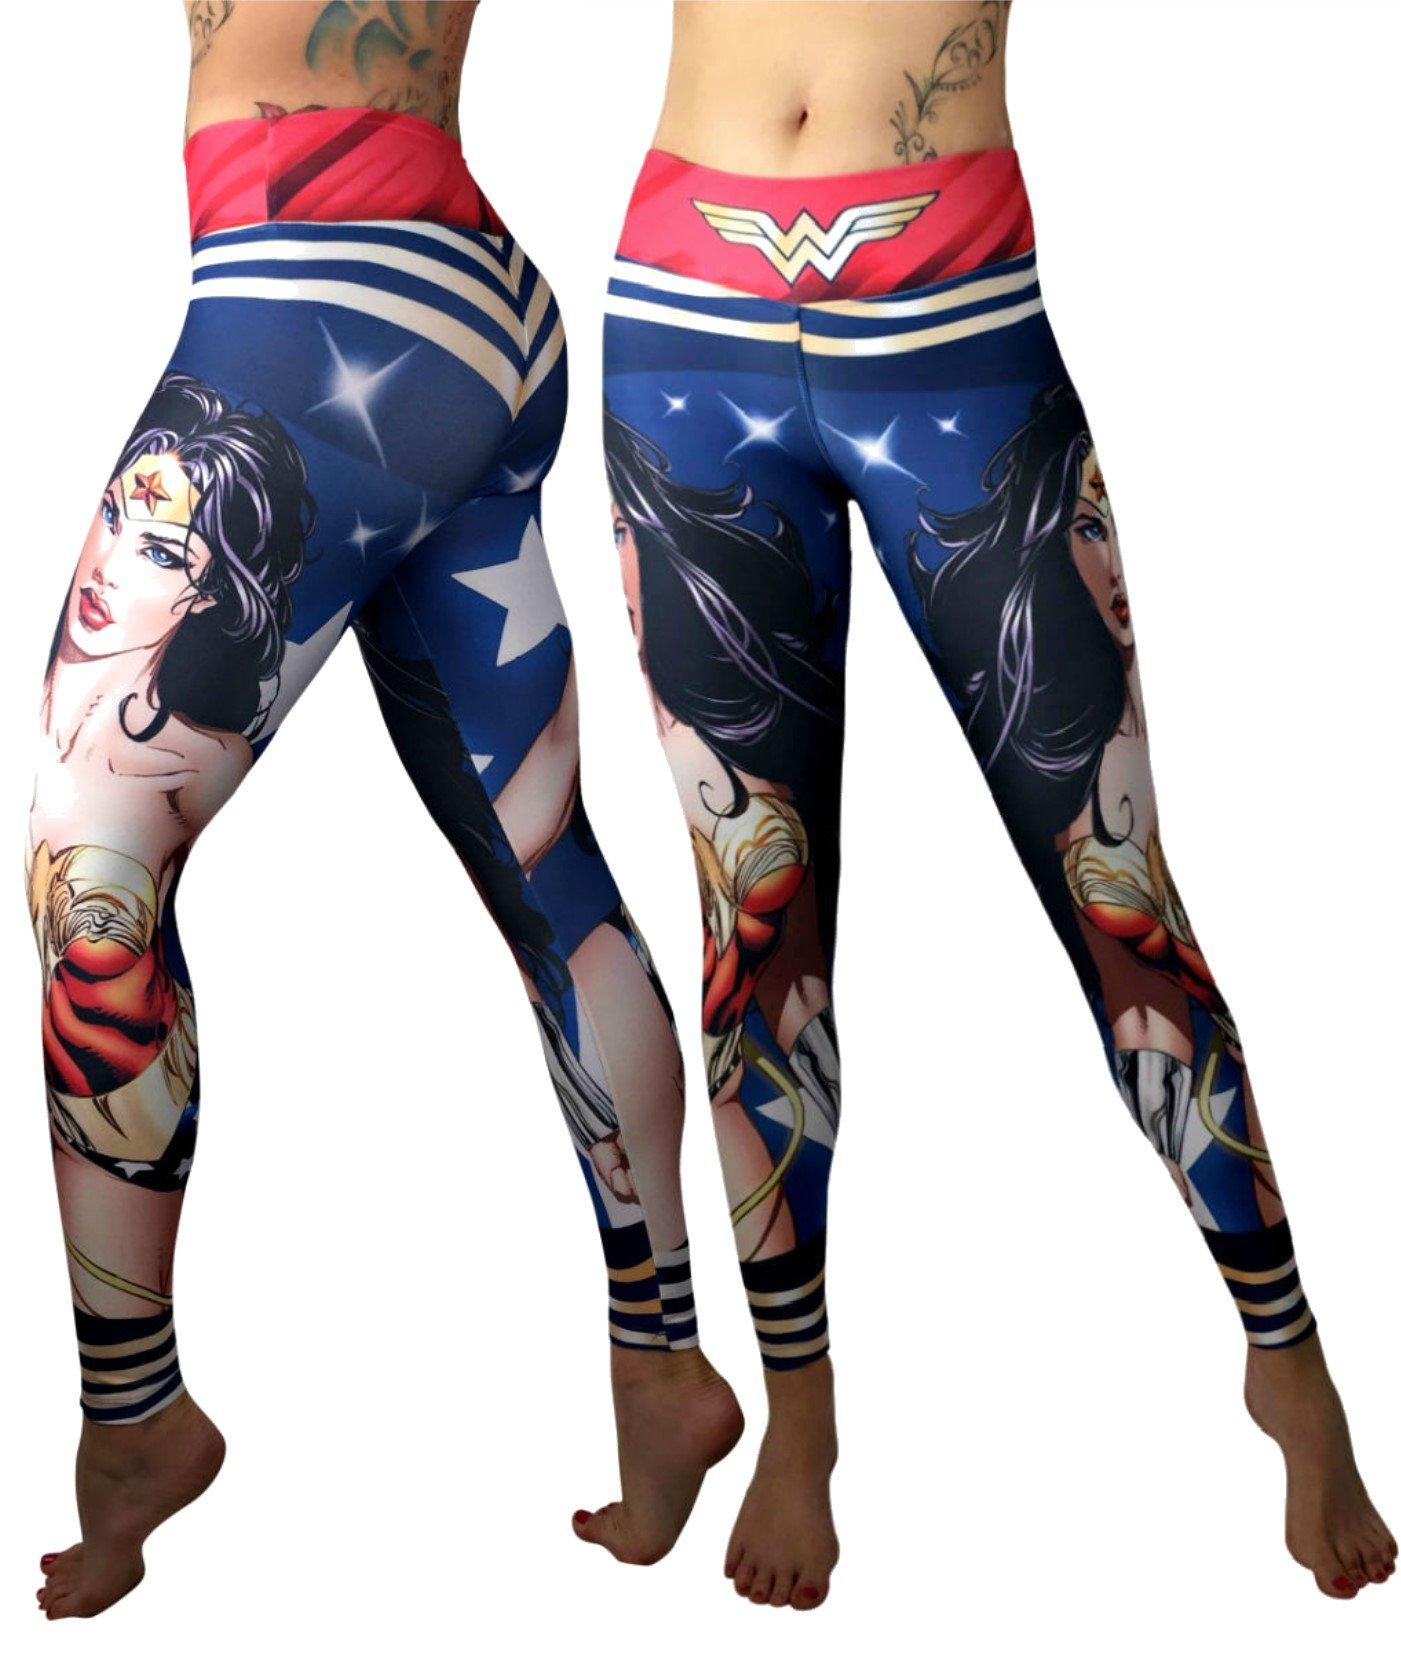 Exit 75 Superhero Leggings Yoga Pants Compression Tights